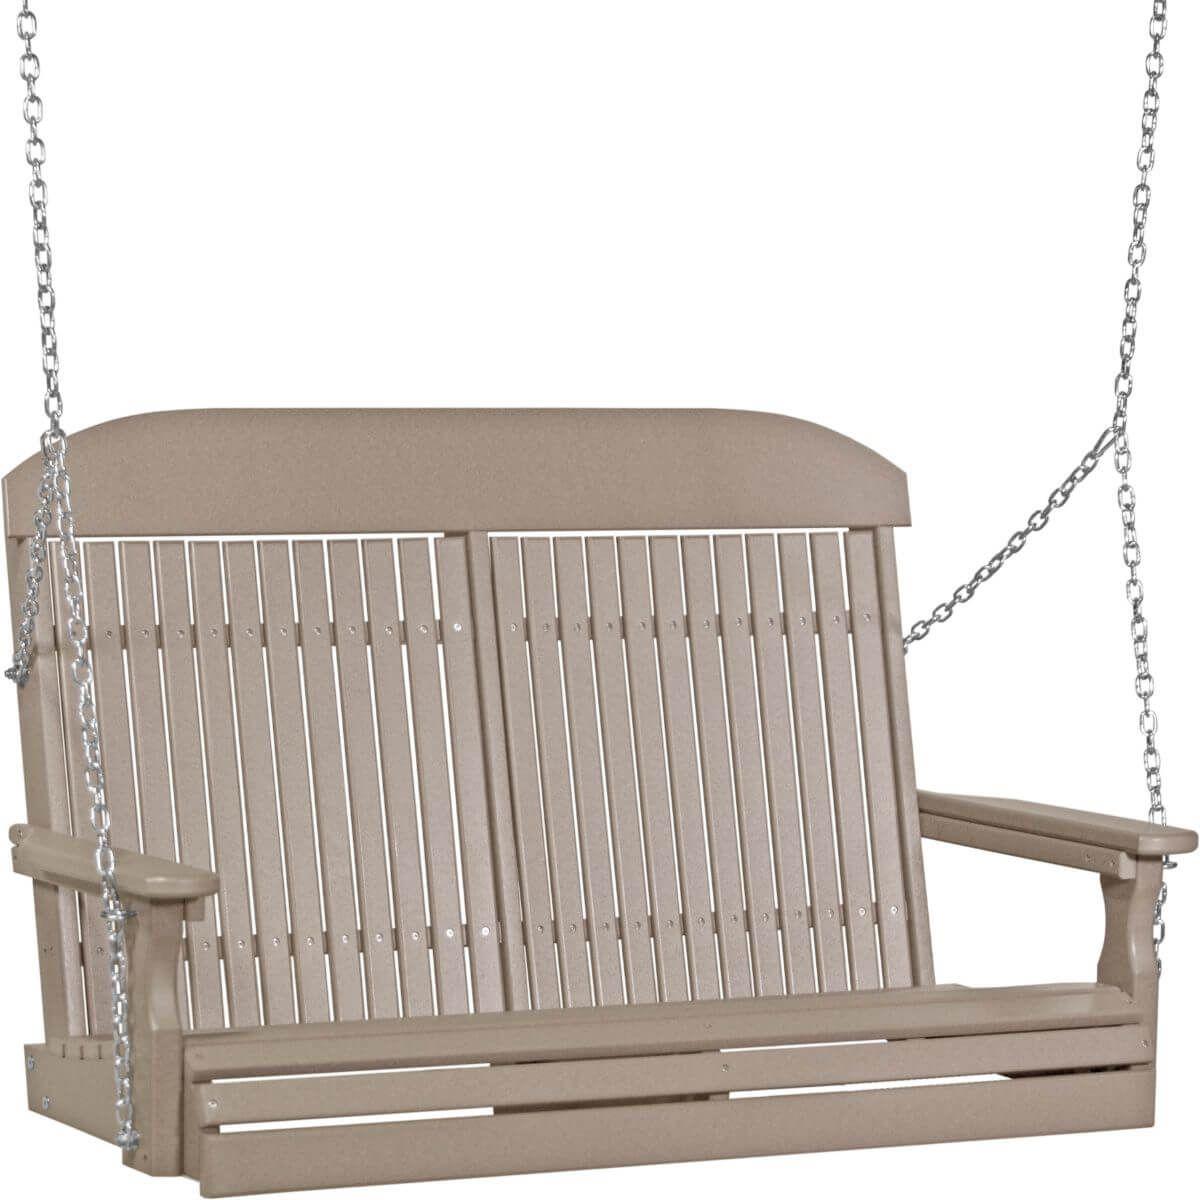 Weatherwood Stockton Porch Swing